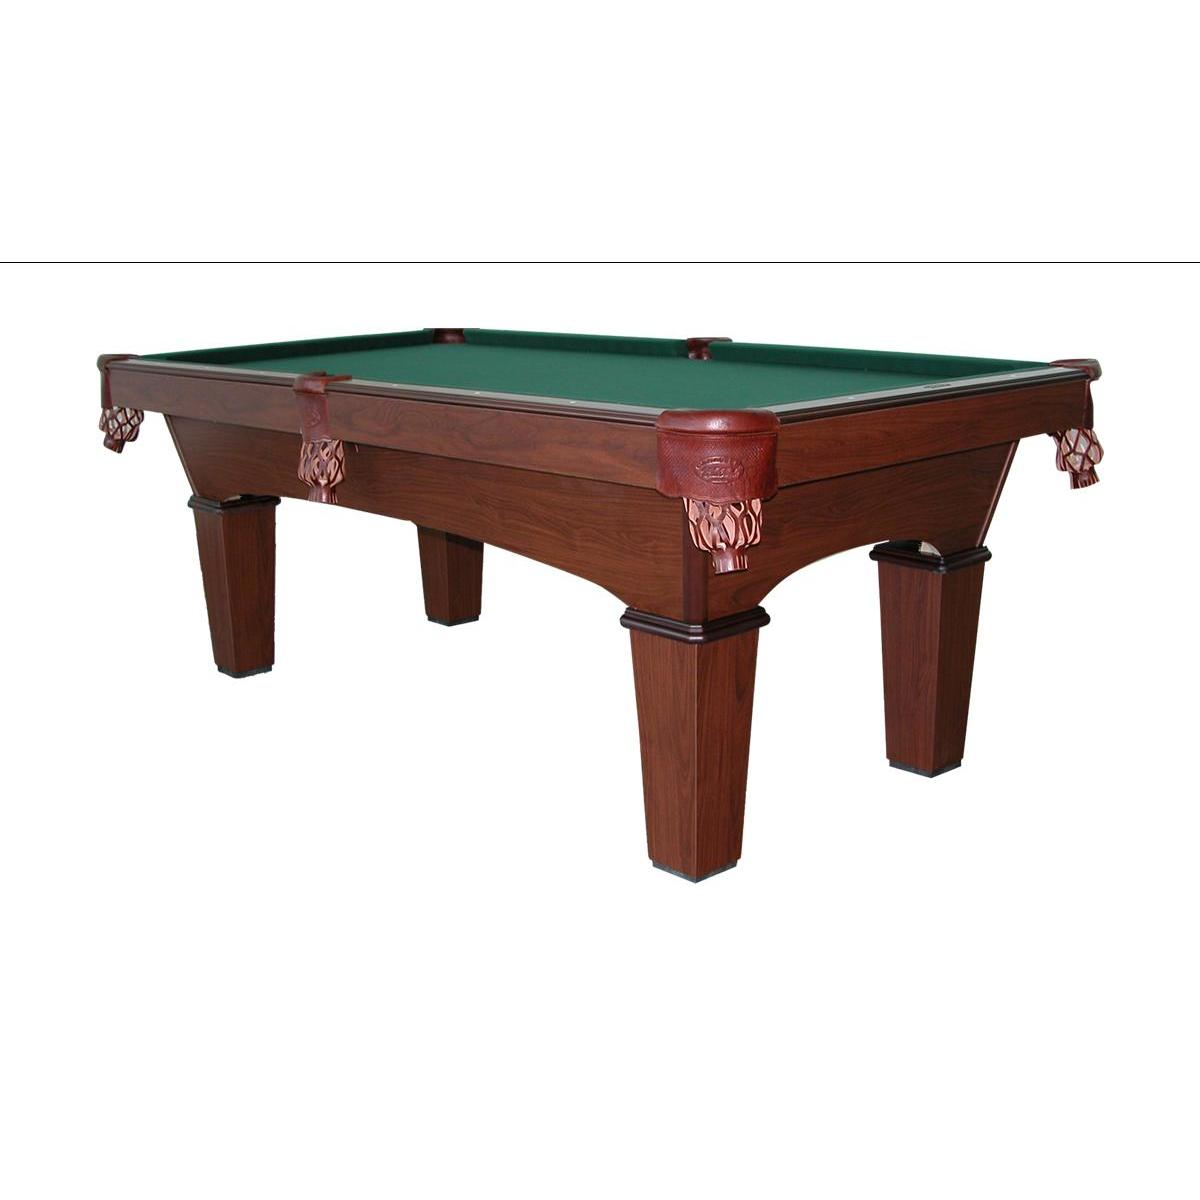 Von's Pool Tables